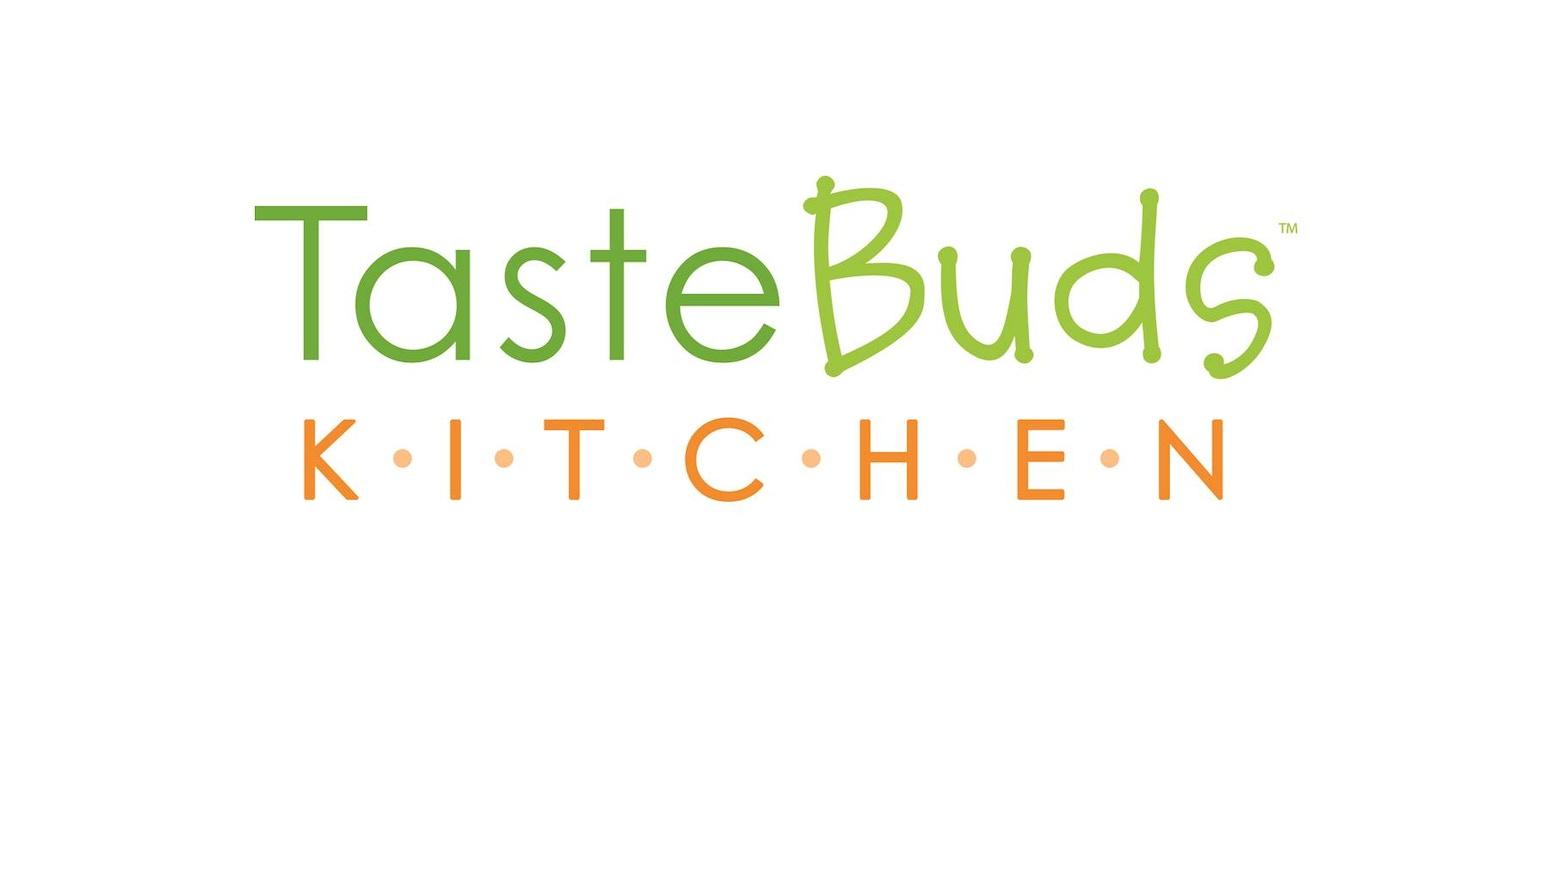 Taste Buds Kitchen Missoula by Christine and Alex Fregerio (deleted ...